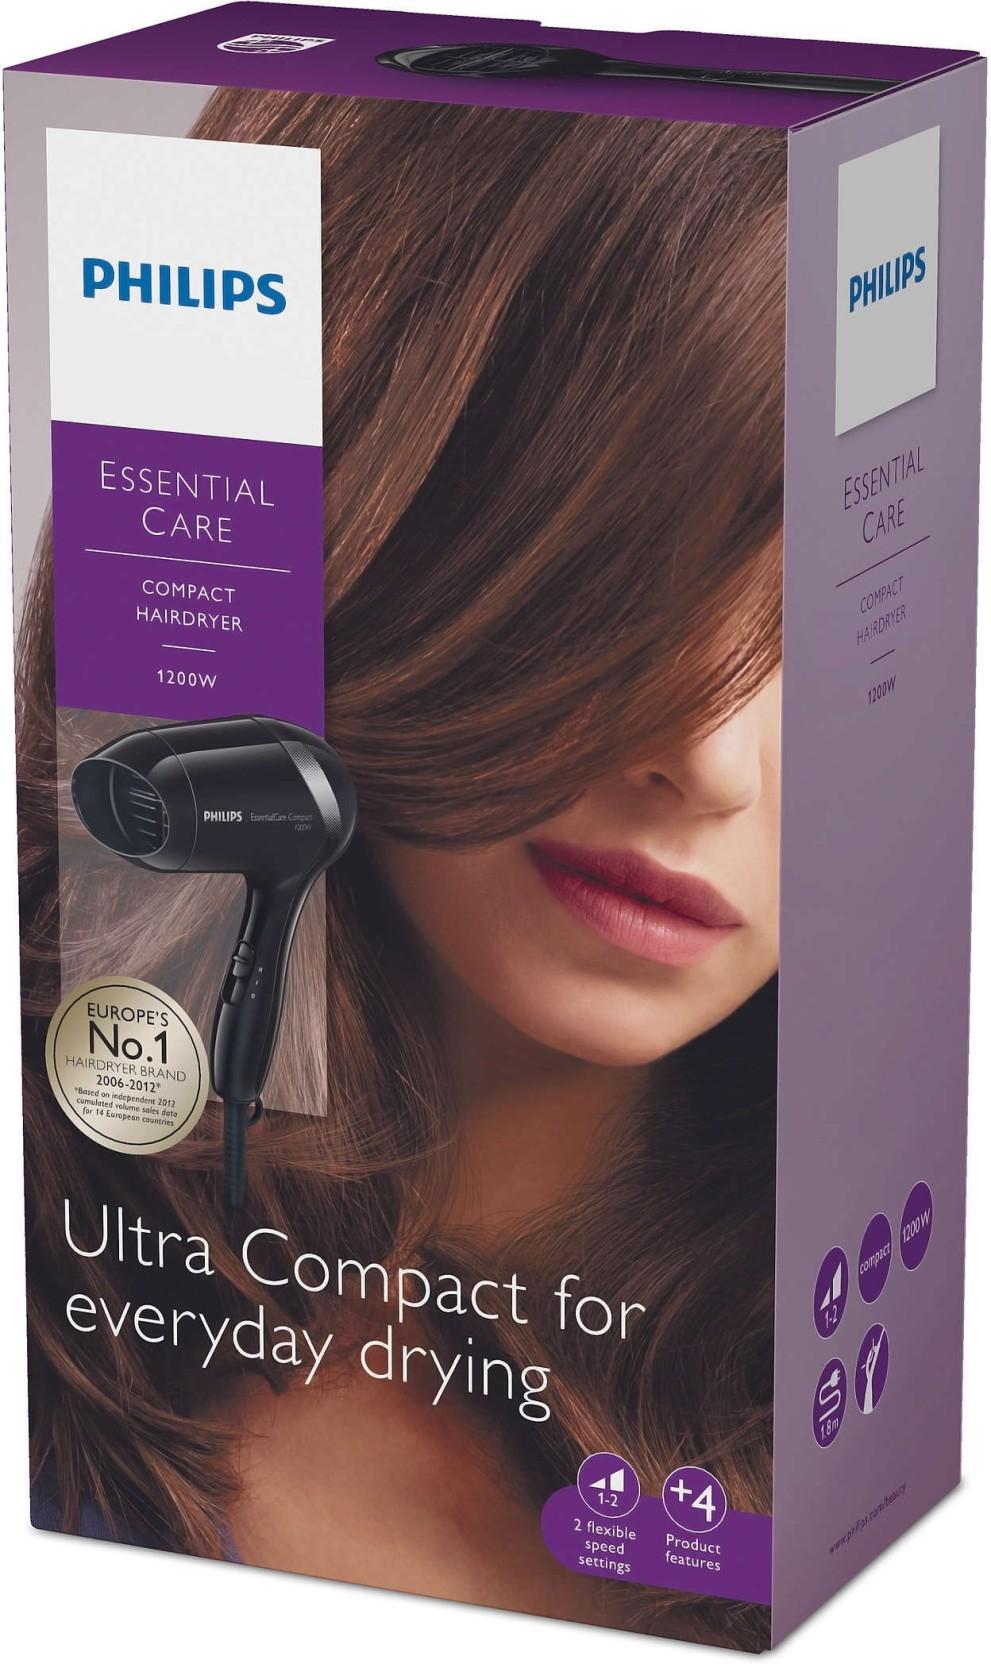 Philips Bhd001 Essential Care Hair Dryer 1200 Watt Hp8108 Add To Cart